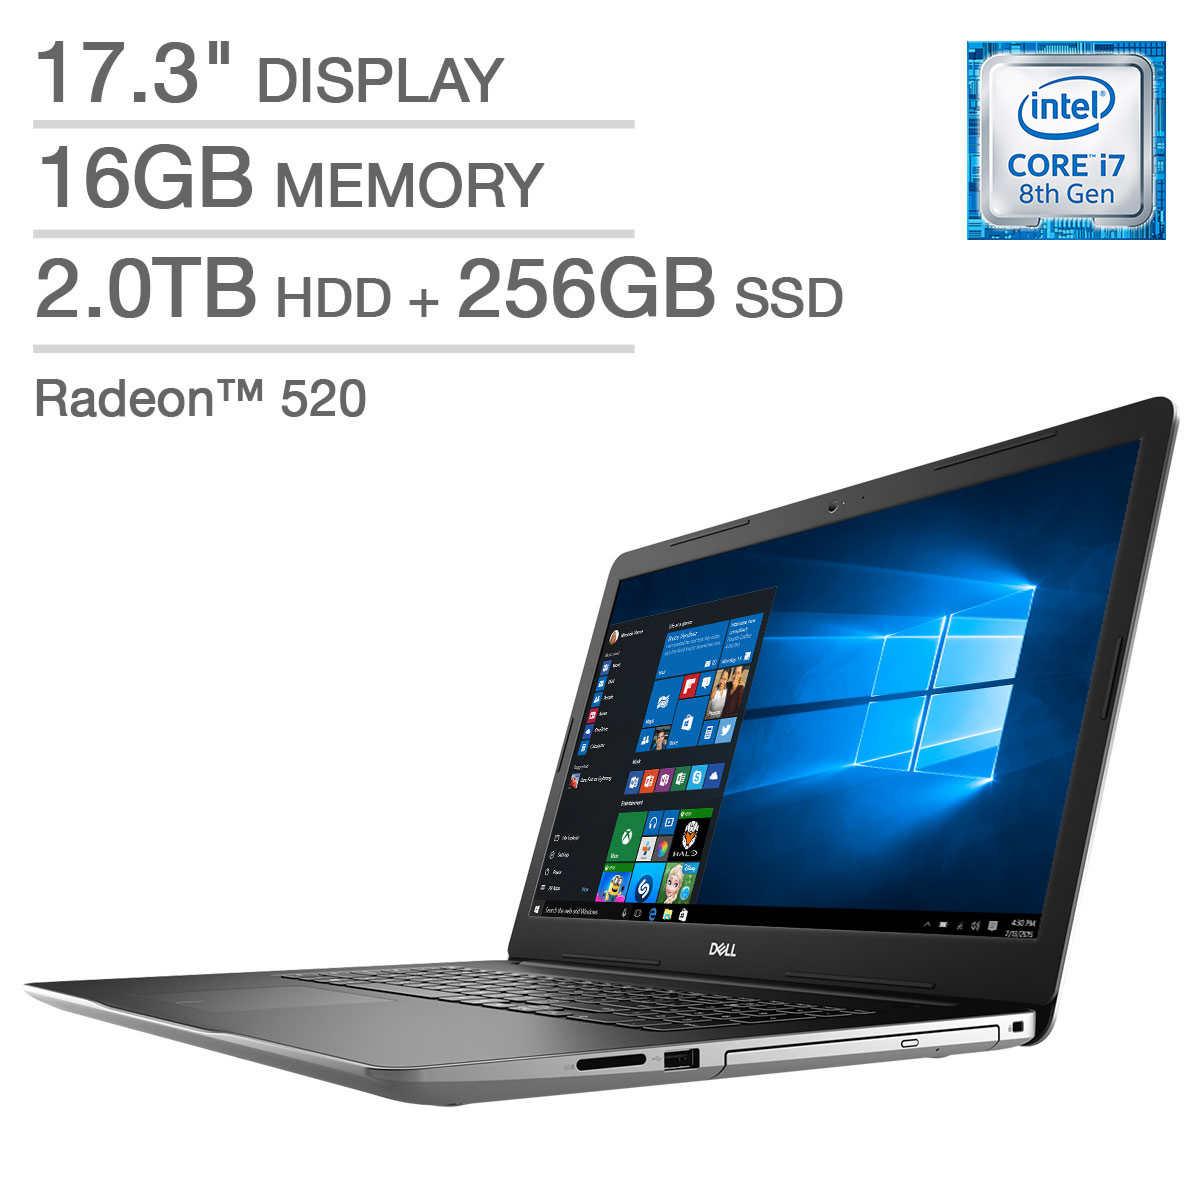 Dell Inspiron 17 3000 Series Laptop - Intel Core i7 - Radeon 520 - 1080p -  Windows 10 Pro